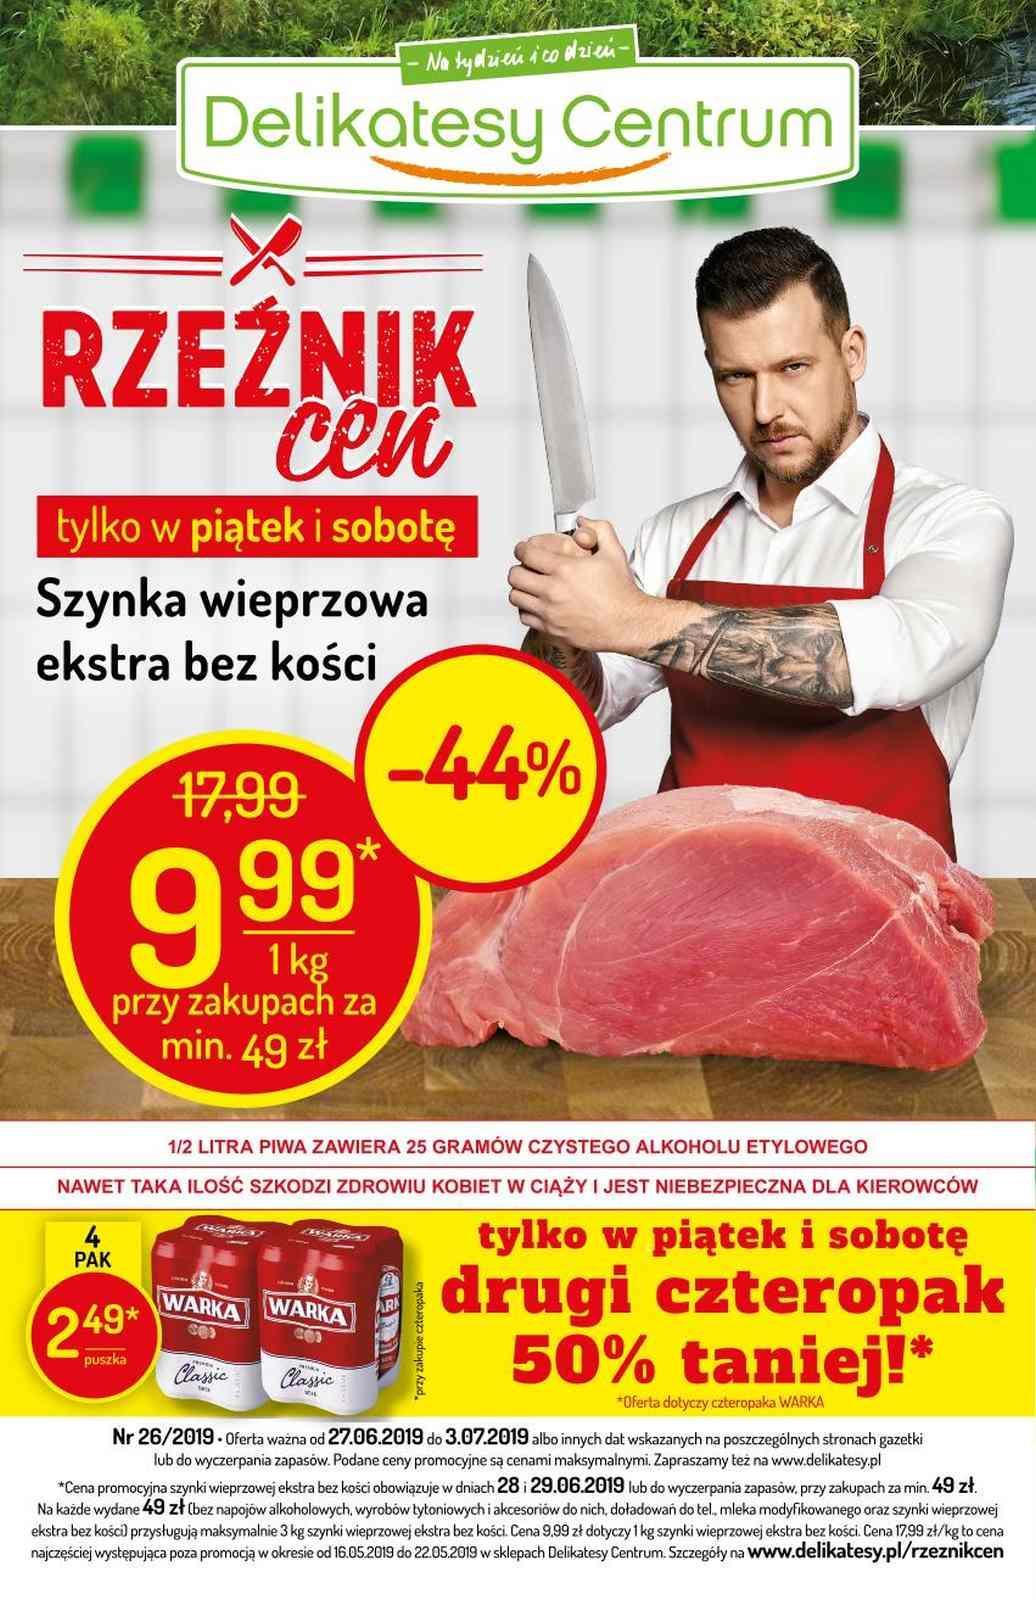 Gazetka promocyjna Delikatesy Centrum do 03/07/2019 str.1